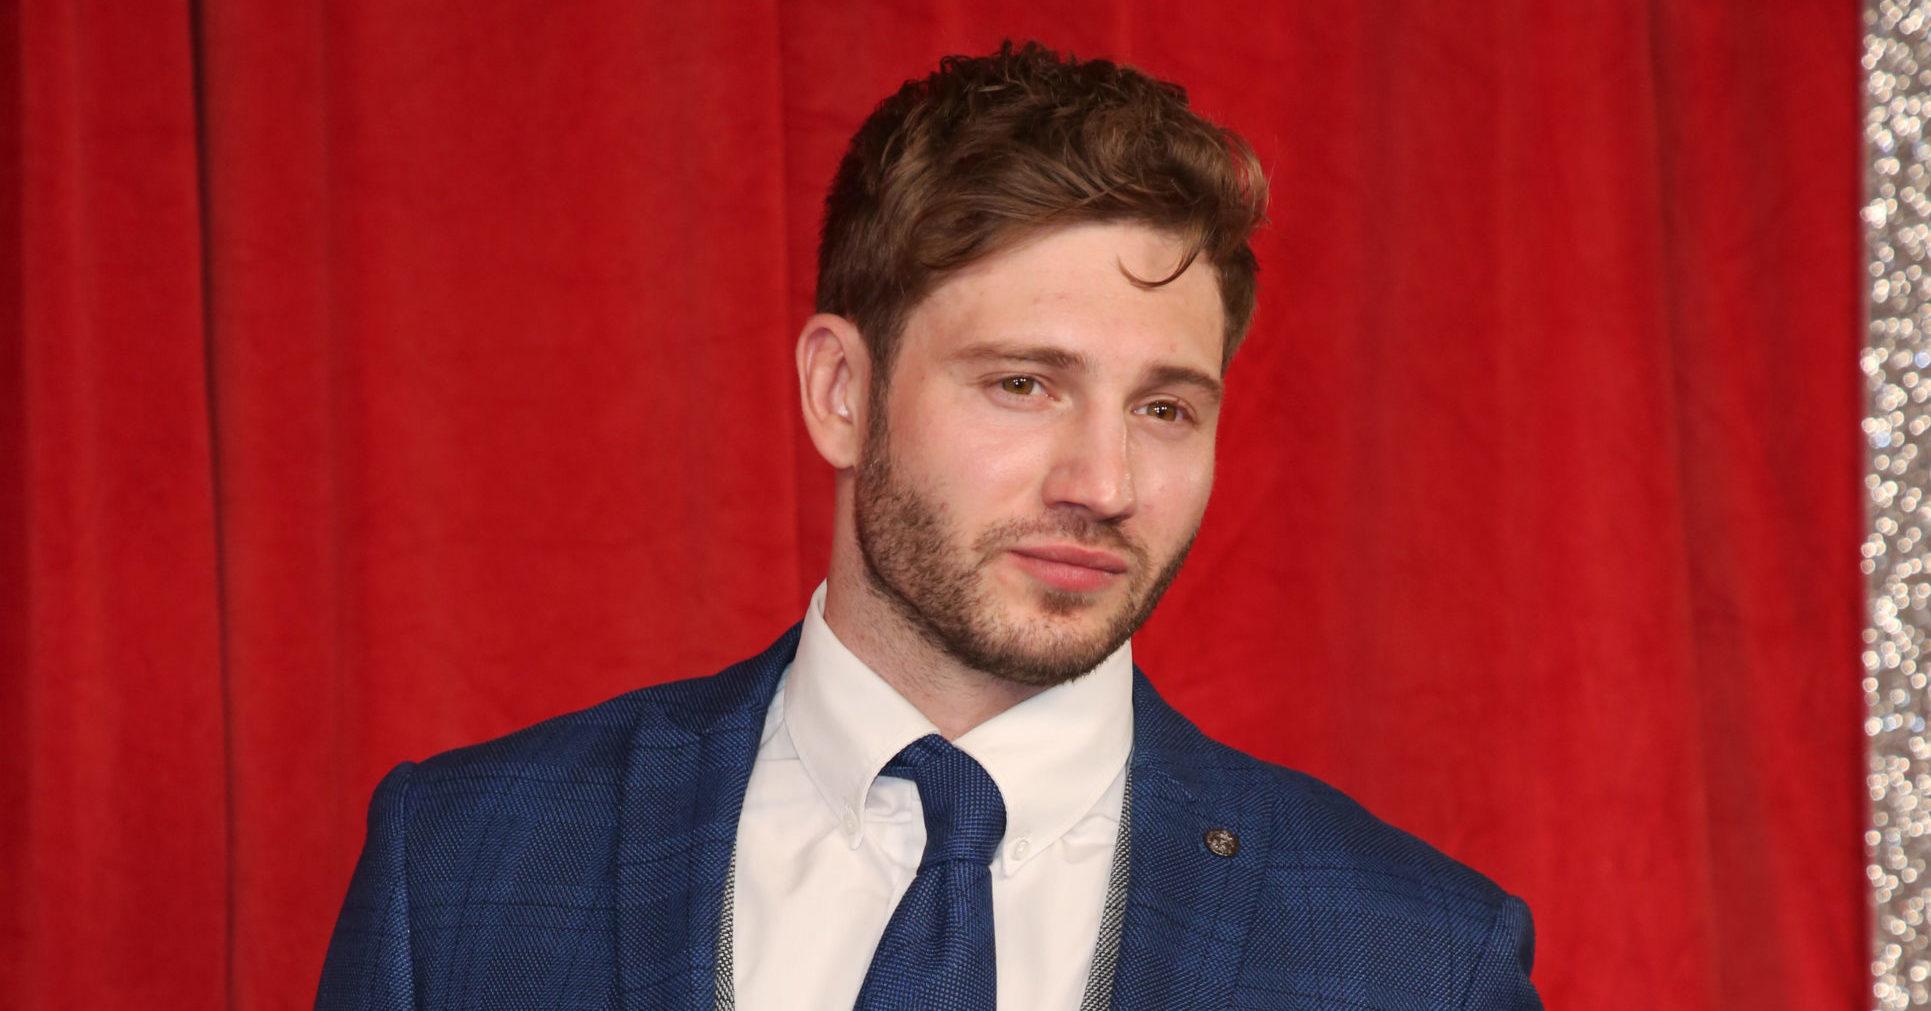 Emmerdale actor Alexander Lincoln who plays Jamie Tate shaves his hair off in lockdown